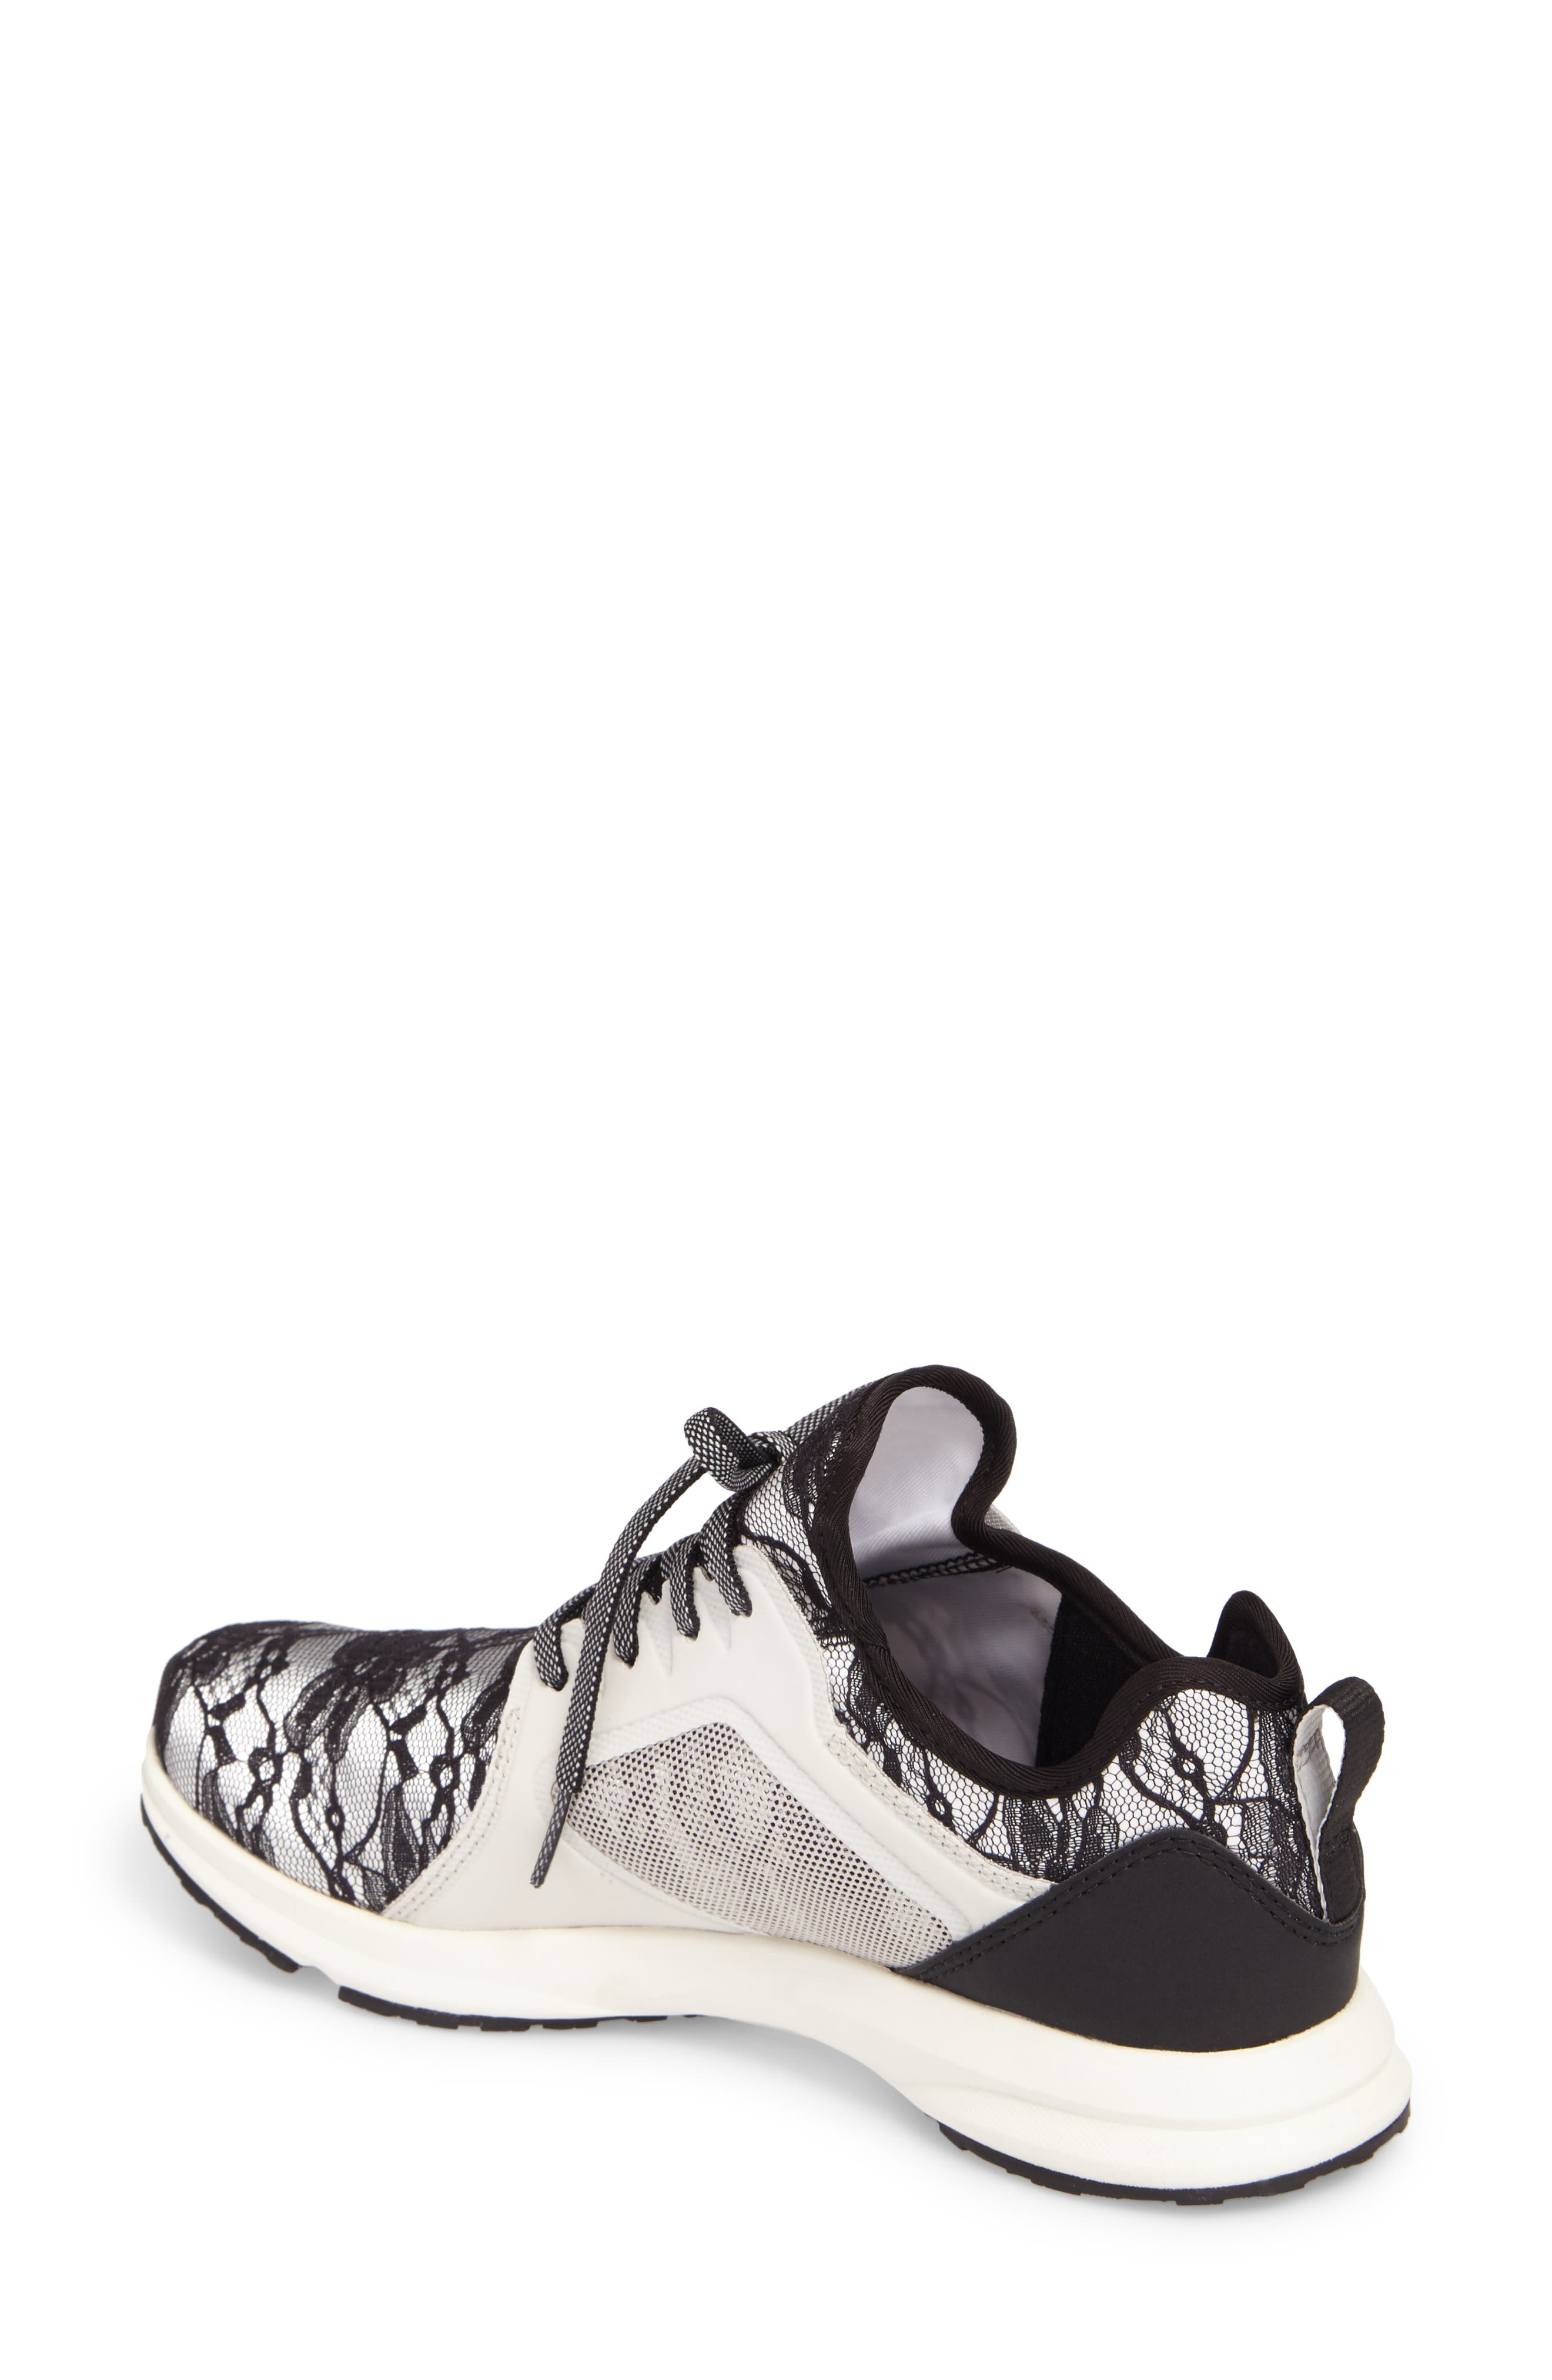 Fuse Print Sneaker,                             Alternate thumbnail 2, color,                             Black Lace